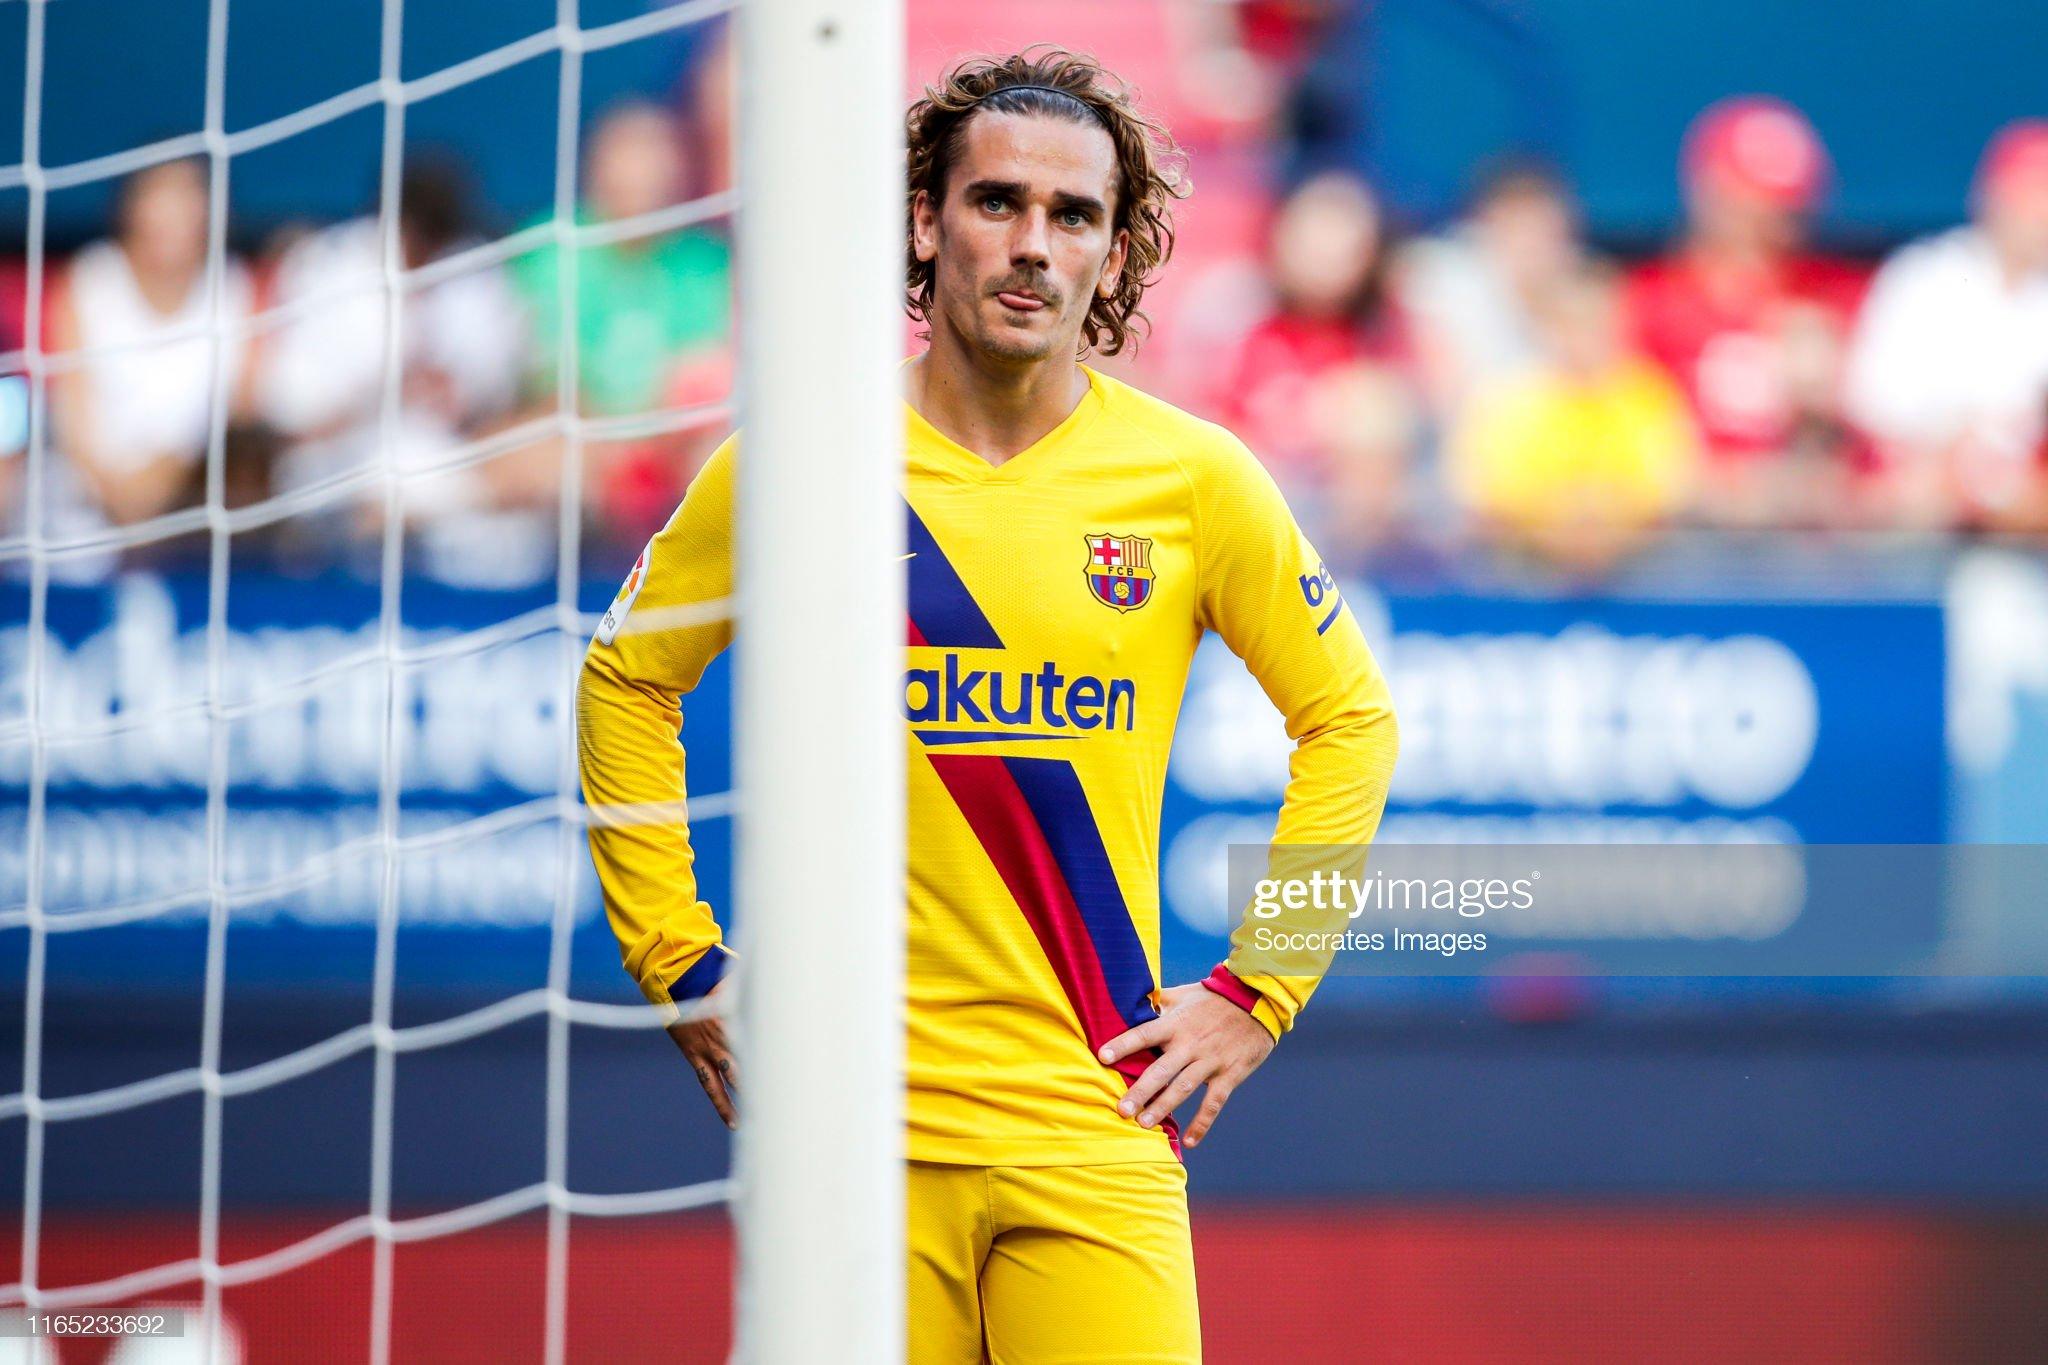 صور مباراة : أوساسونا - برشلونة 2-2 ( 31-08-2019 )  Antoine-griezmann-of-fc-barcelona-during-the-la-liga-santander-match-picture-id1165233692?s=2048x2048